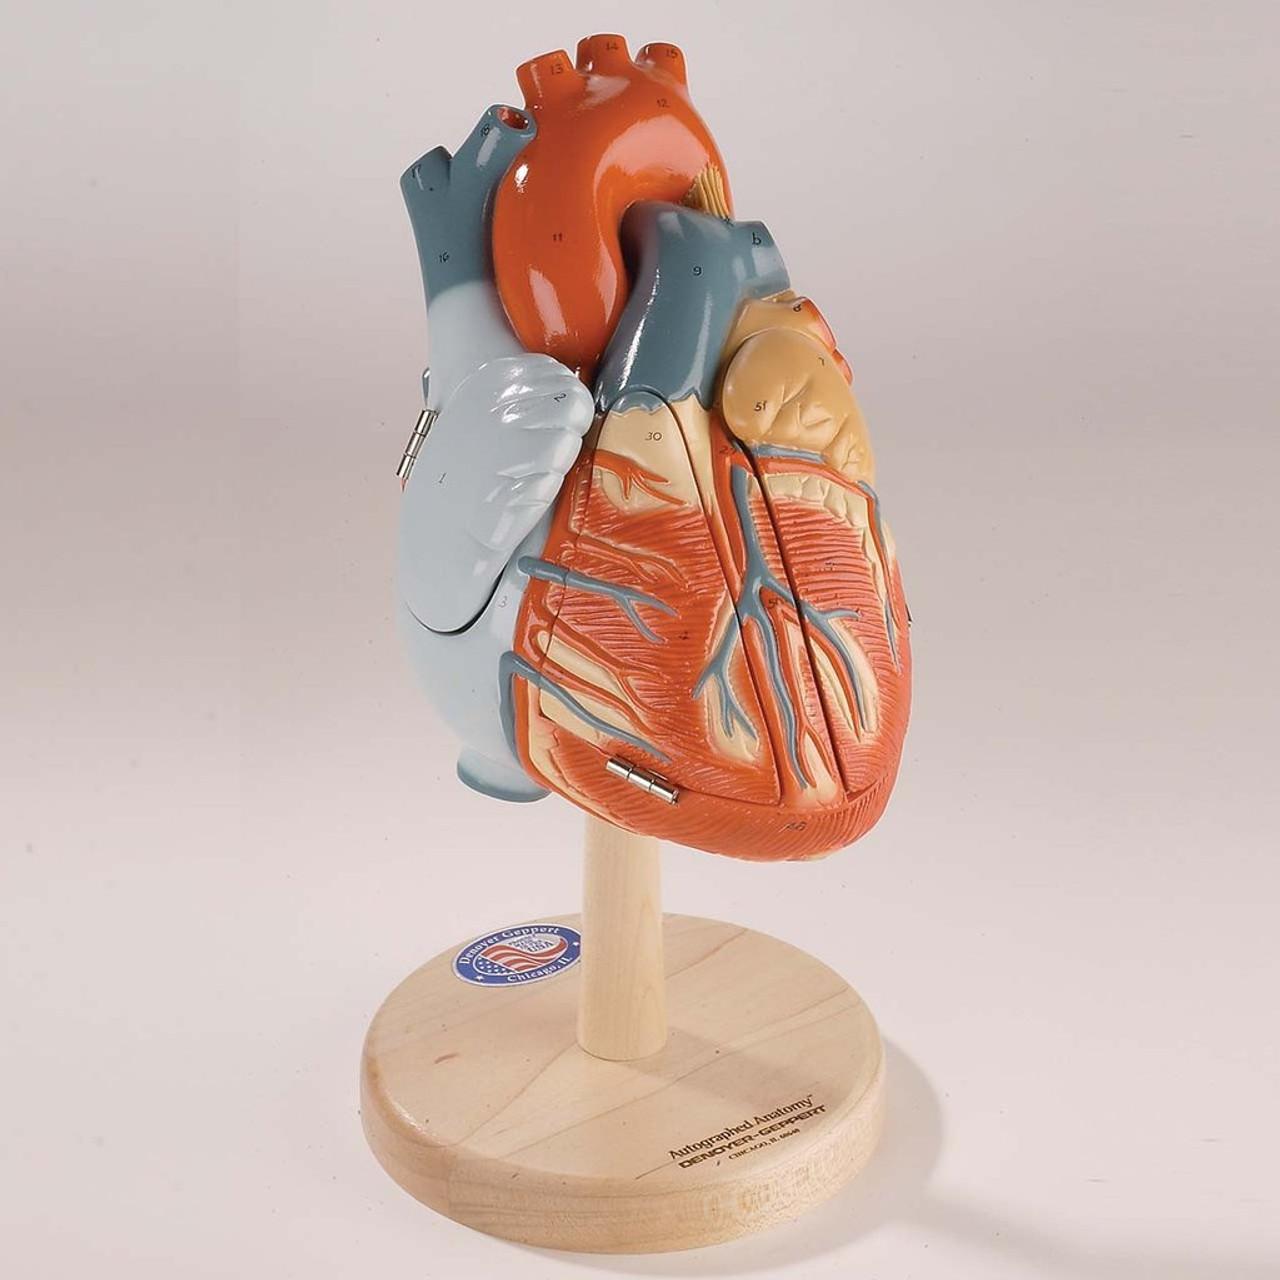 Heart of America Anatomical Model